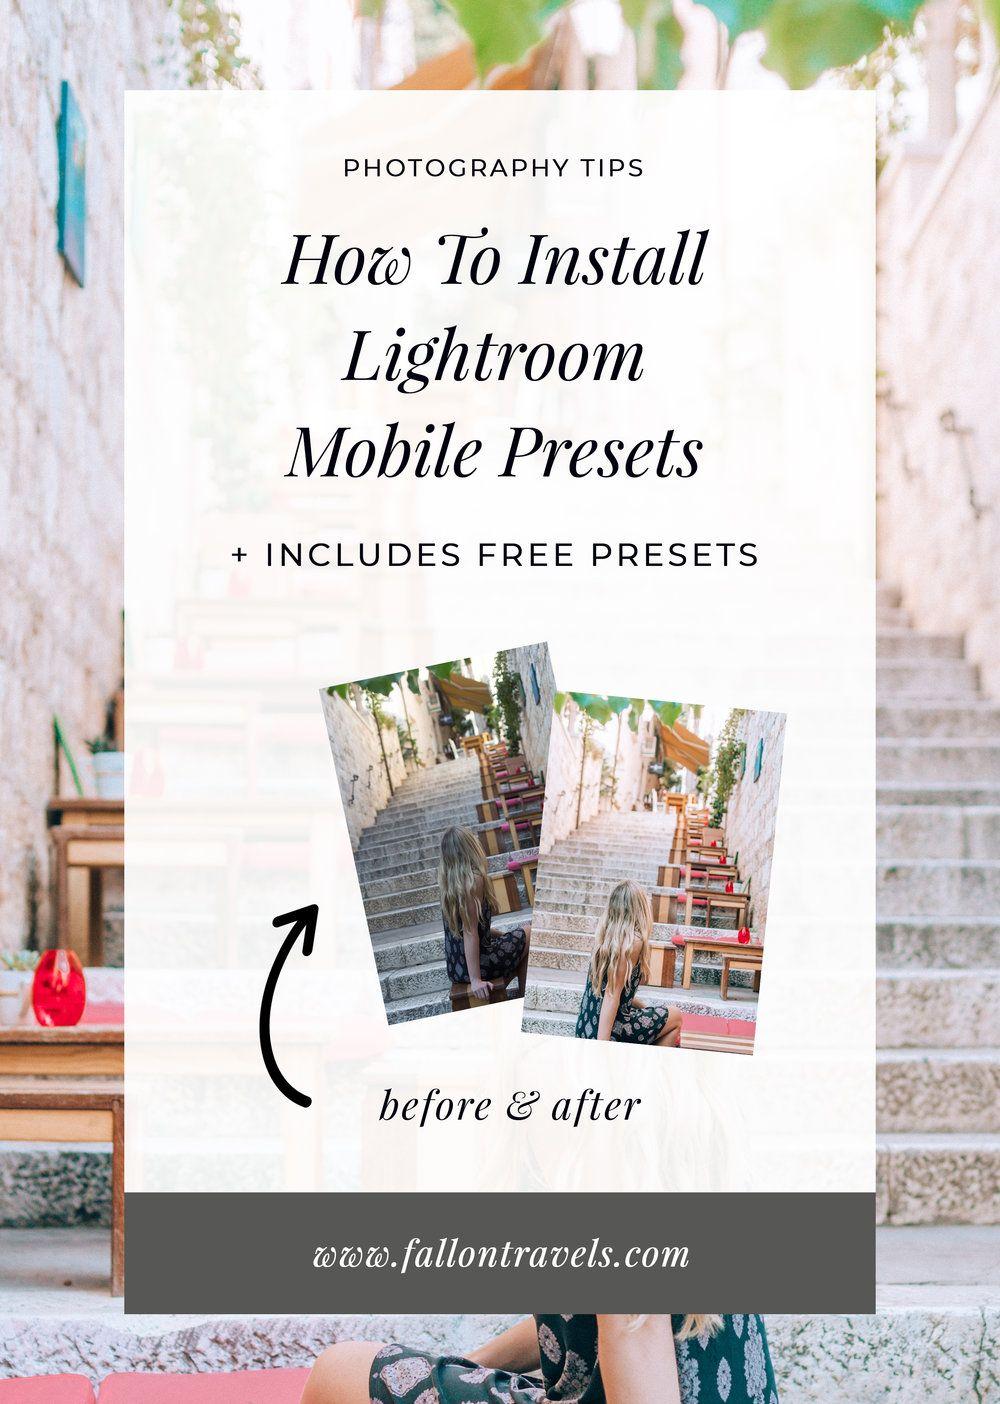 How Do I Add Presets To Lightroom Cc Mobile